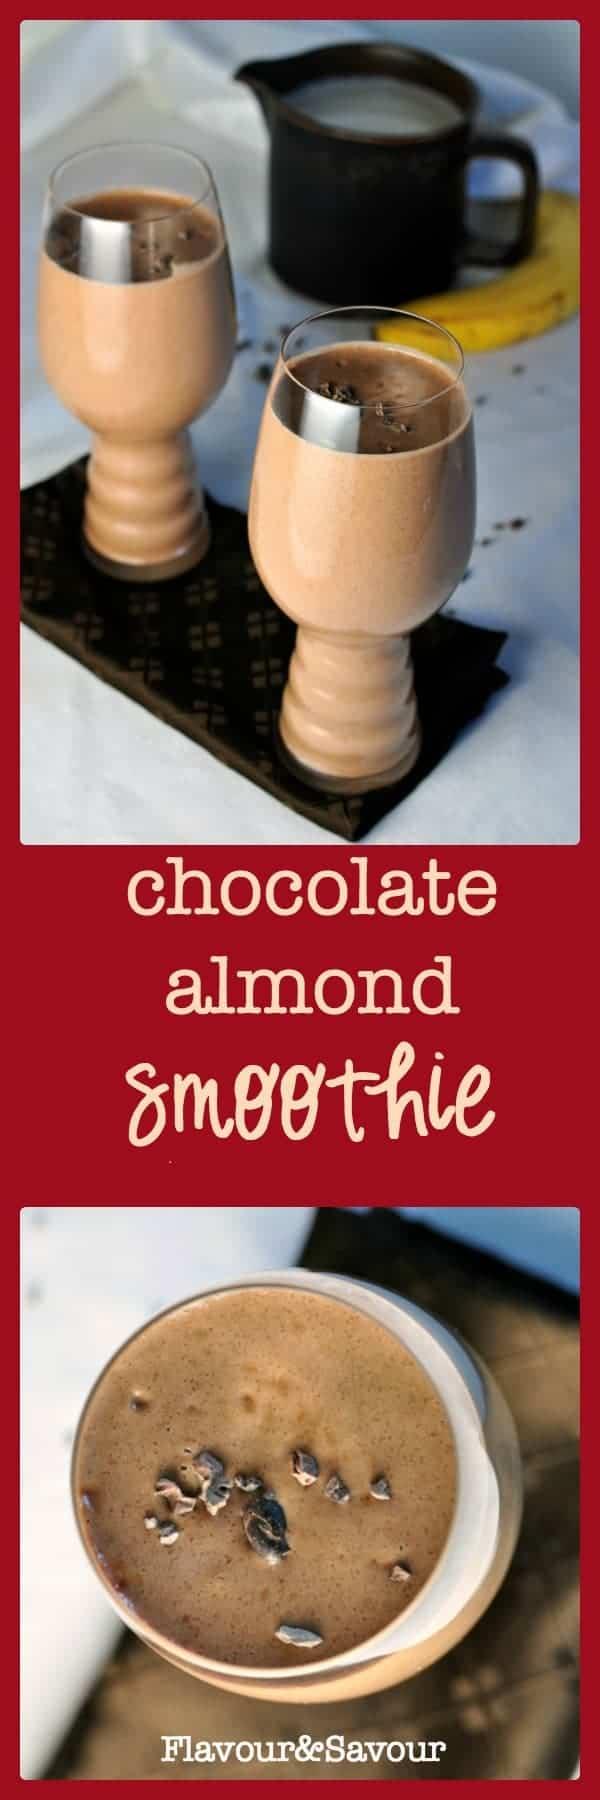 Paleo Chocolate Almond Smoothie dairy-free deliciousness paleo|www.flavourandsavour.com